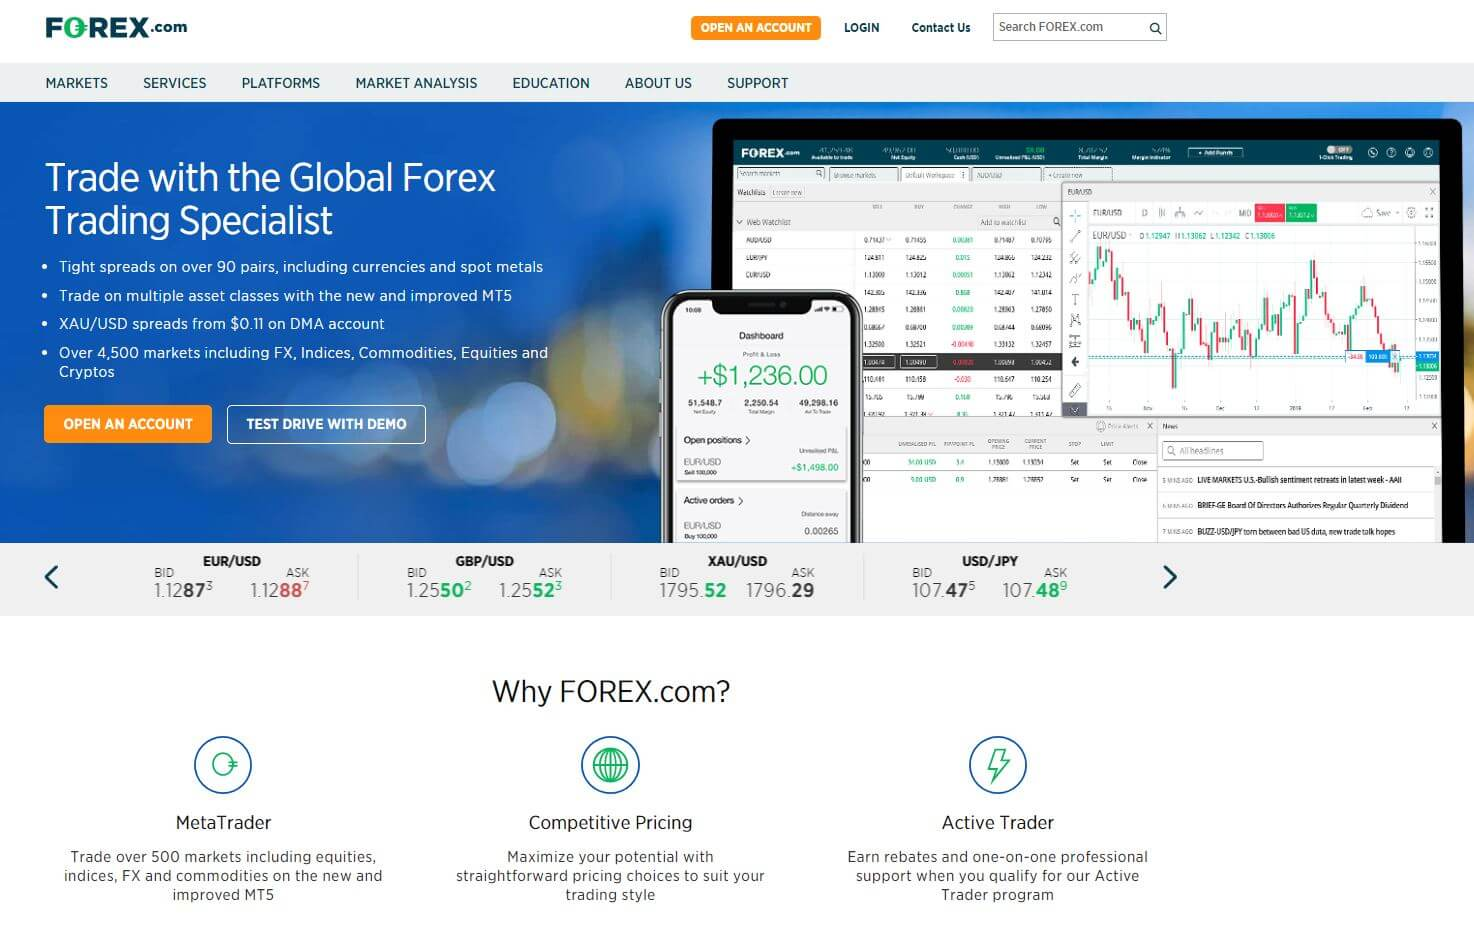 forex.com broker review homepage